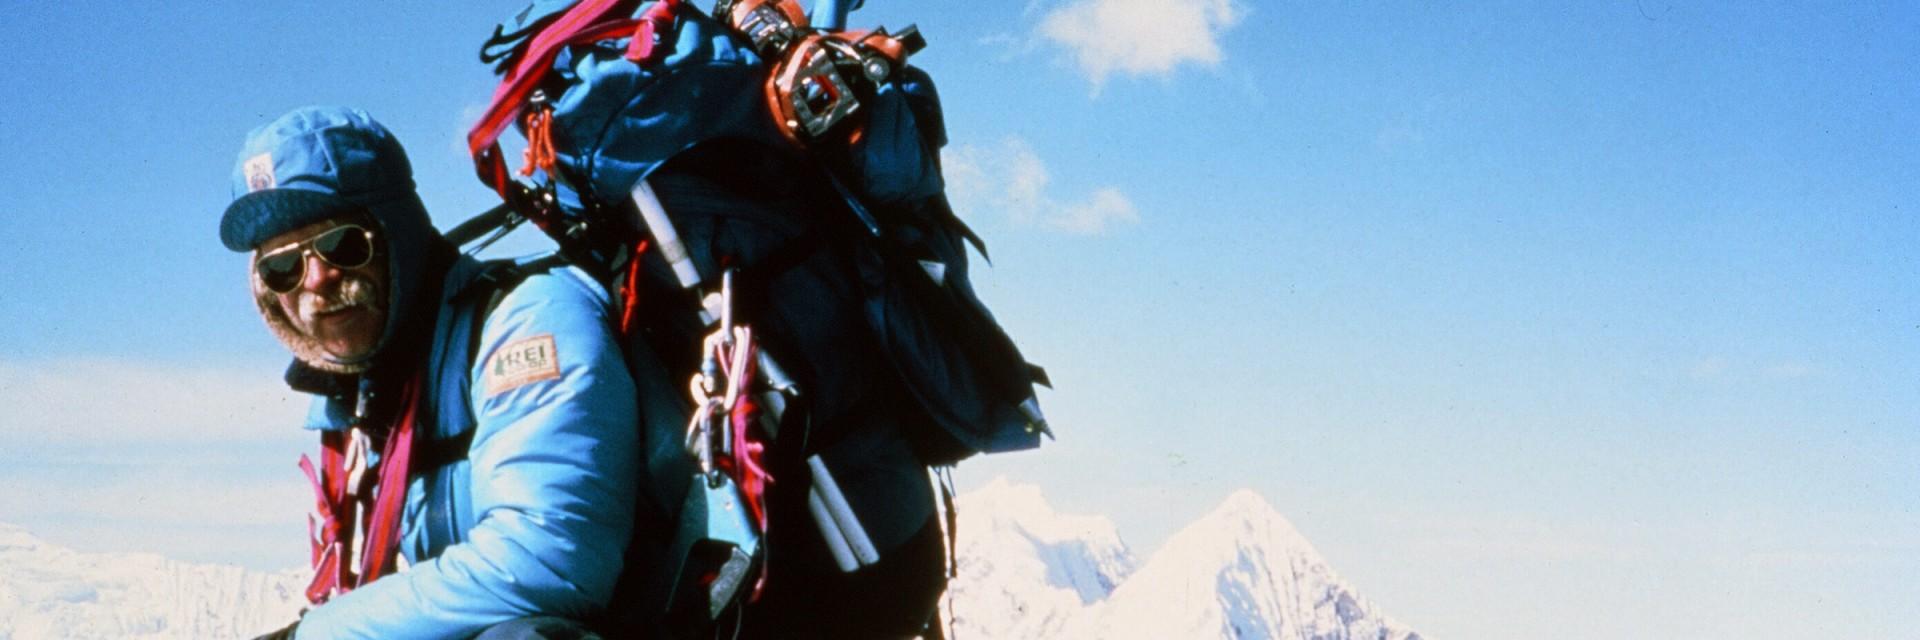 50 years of Lowe Alpine on See Outside